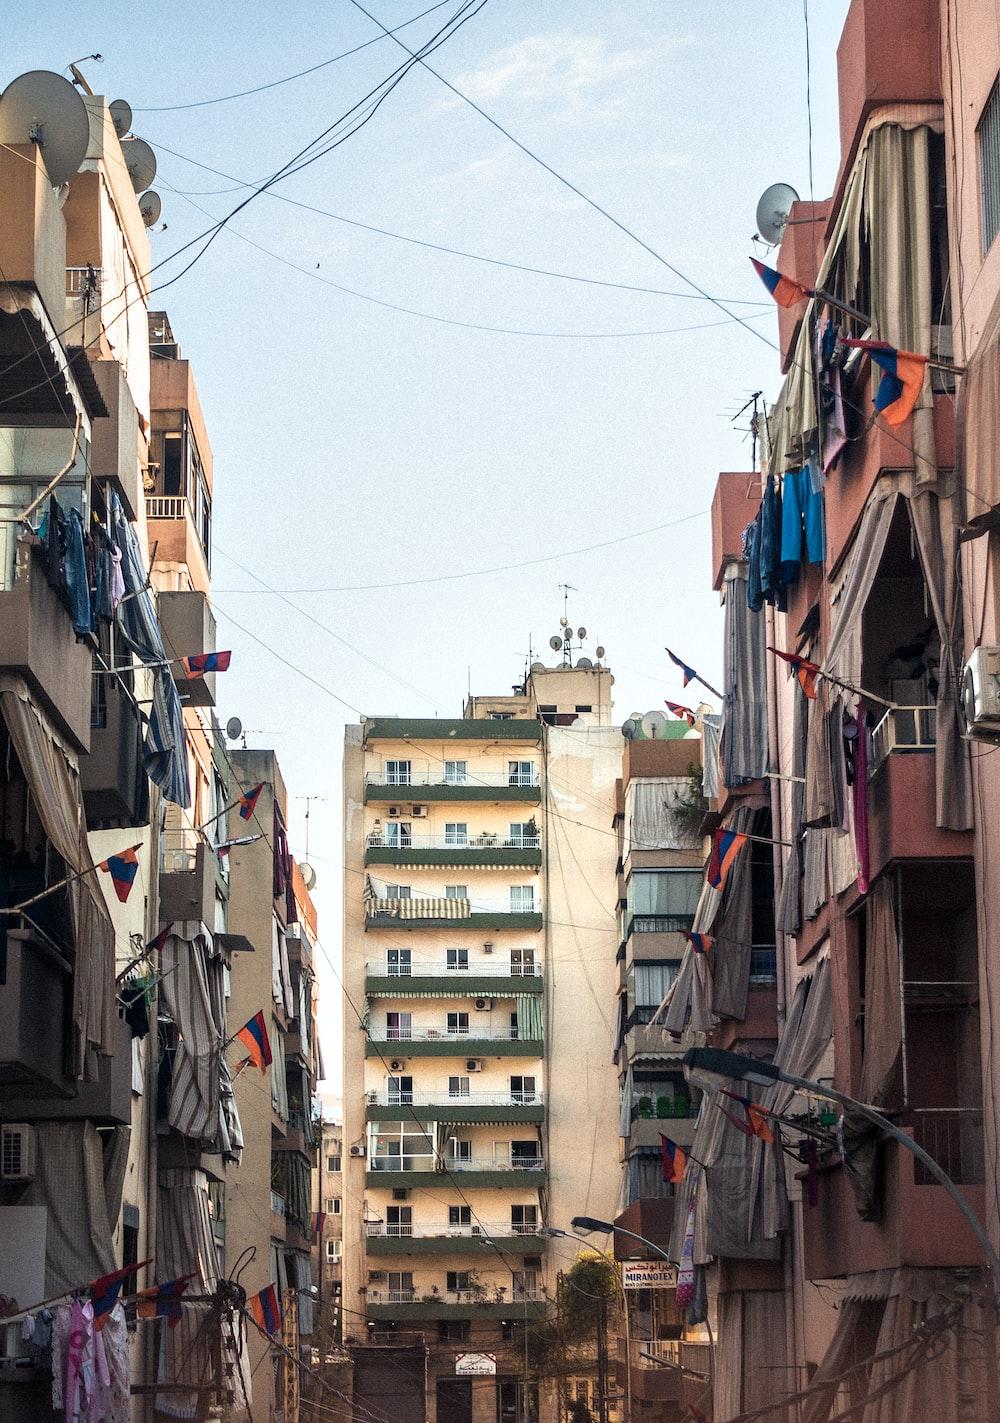 narrow street between concrete buildings